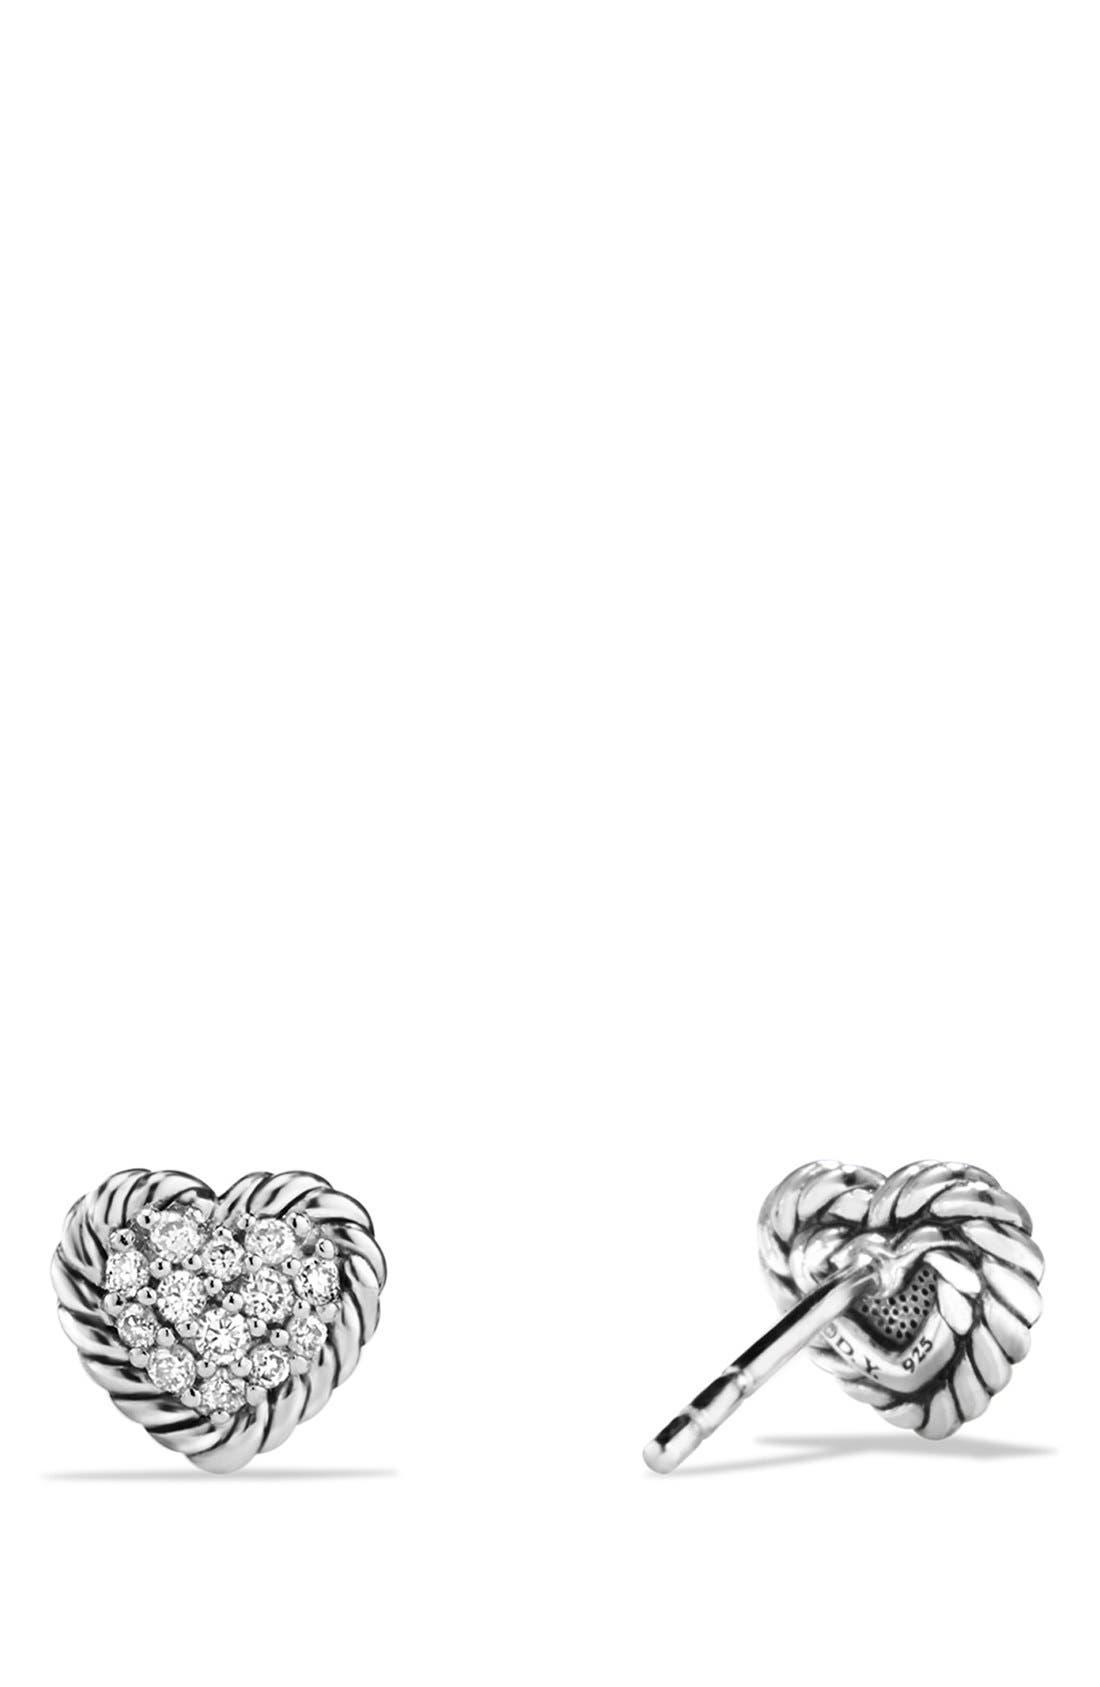 DAVID YURMAN,                             'Châtelaine' Heart Earrings with Diamonds,                             Alternate thumbnail 3, color,                             SILVER